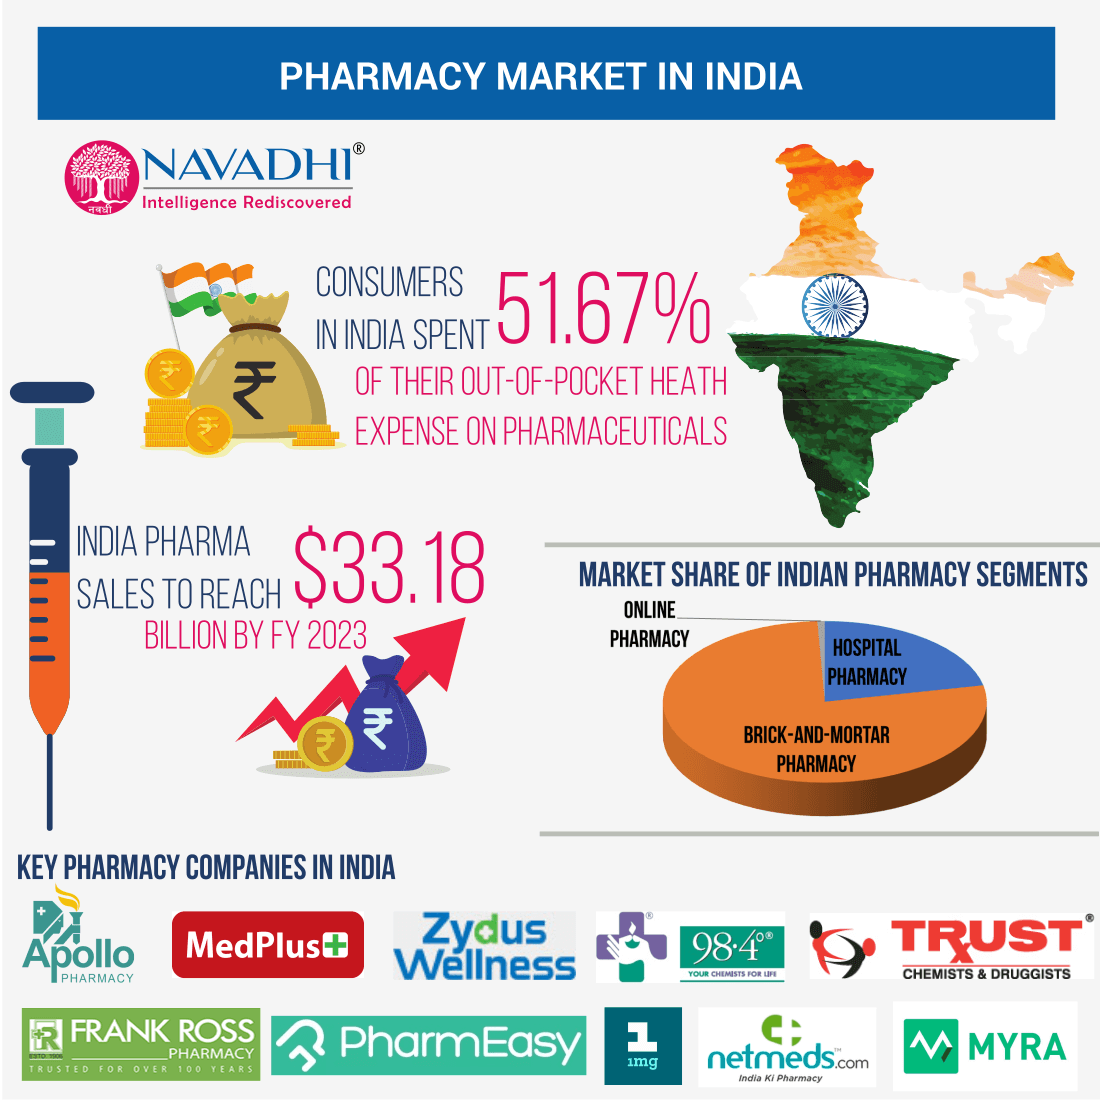 Pharmacy Market in India